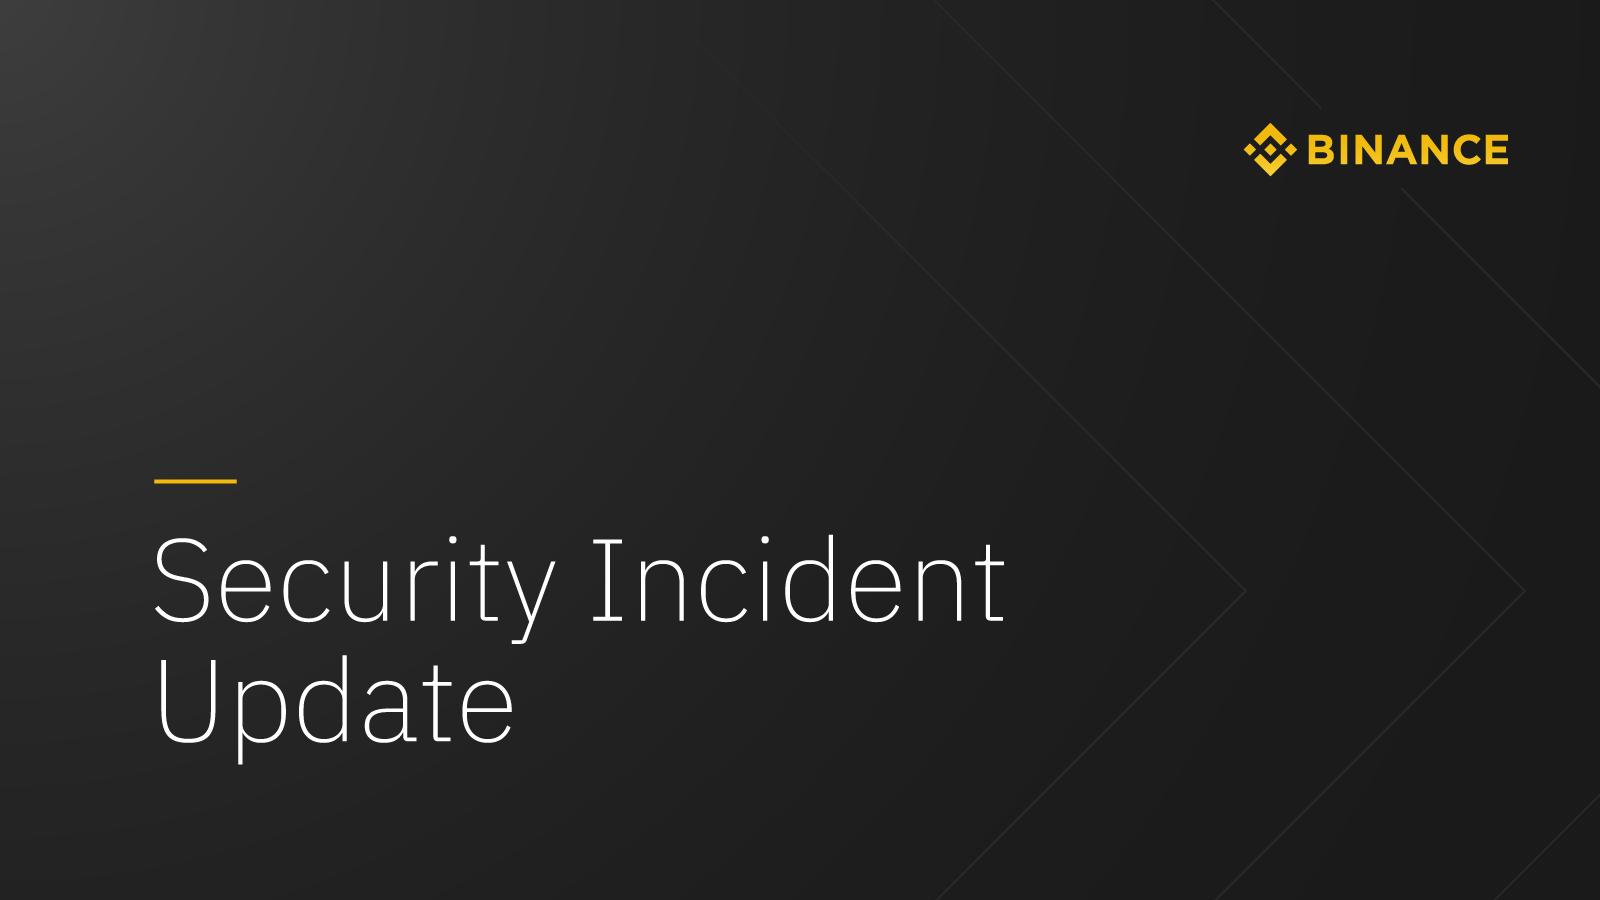 Binance Security Incident Update #2 | Binance Blog